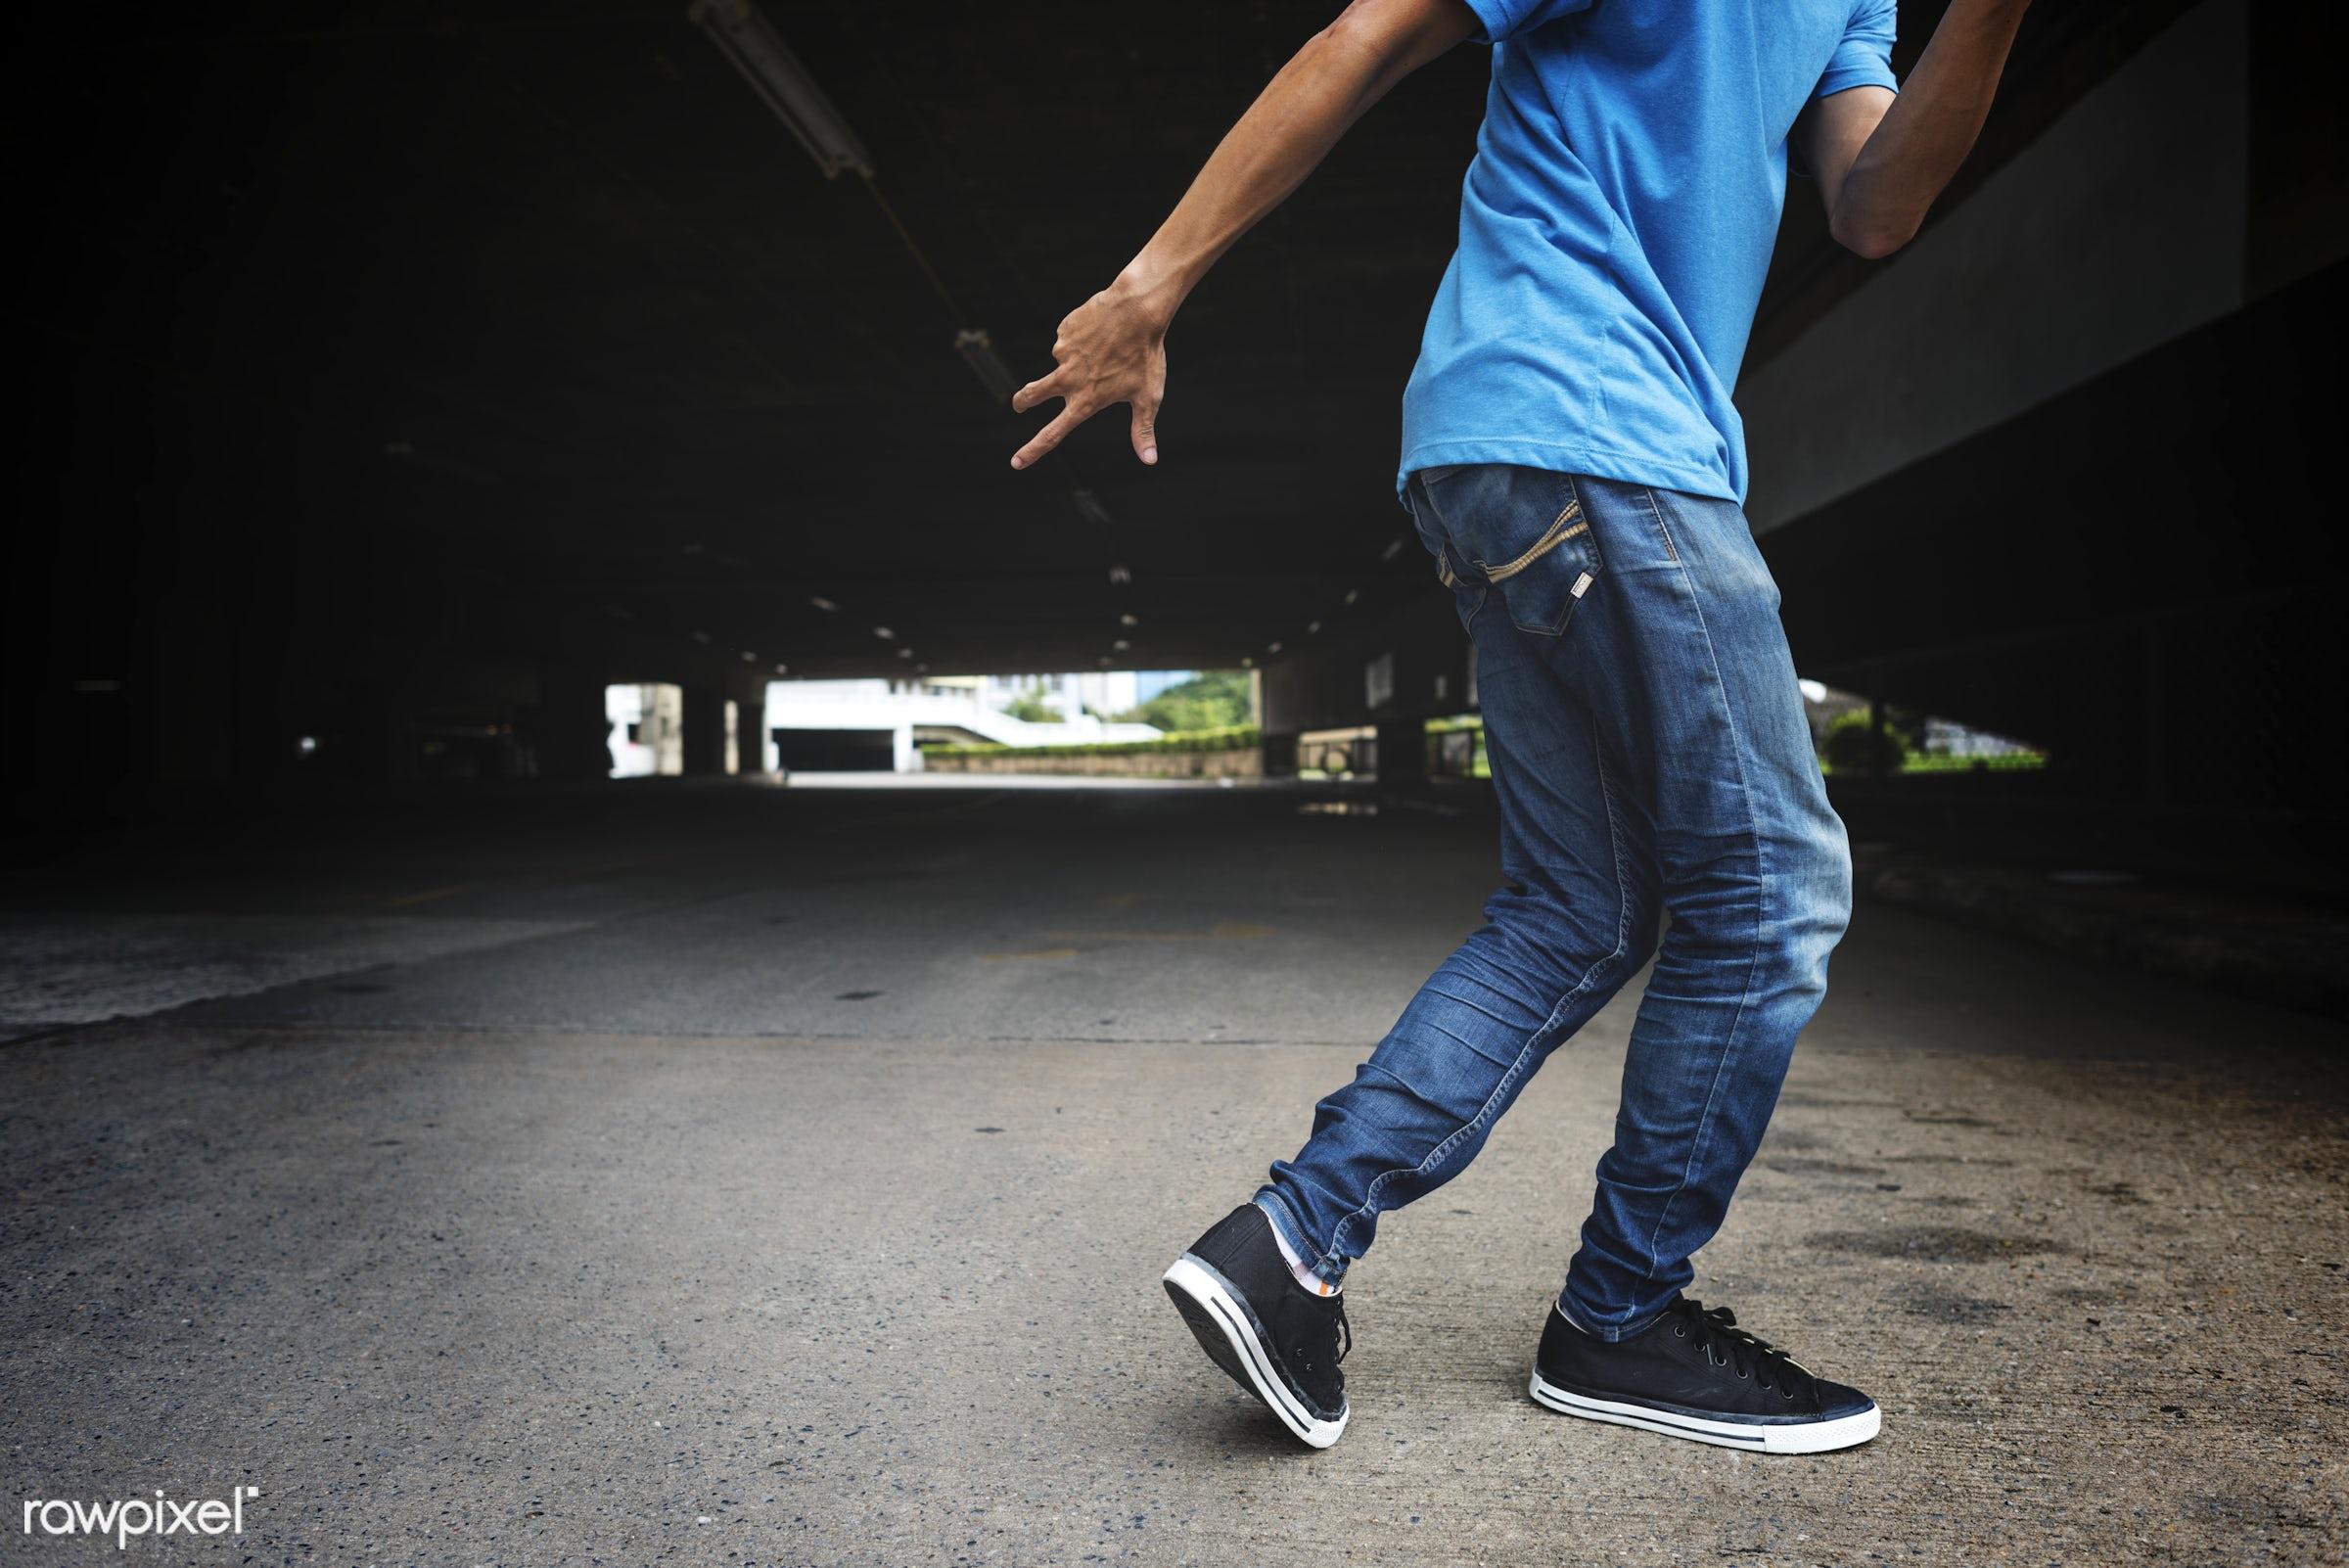 action, asian, attractive, b-boy, b-boying, boy, break, break dancer, break dancers, breakdance, breakdancing, culture,...